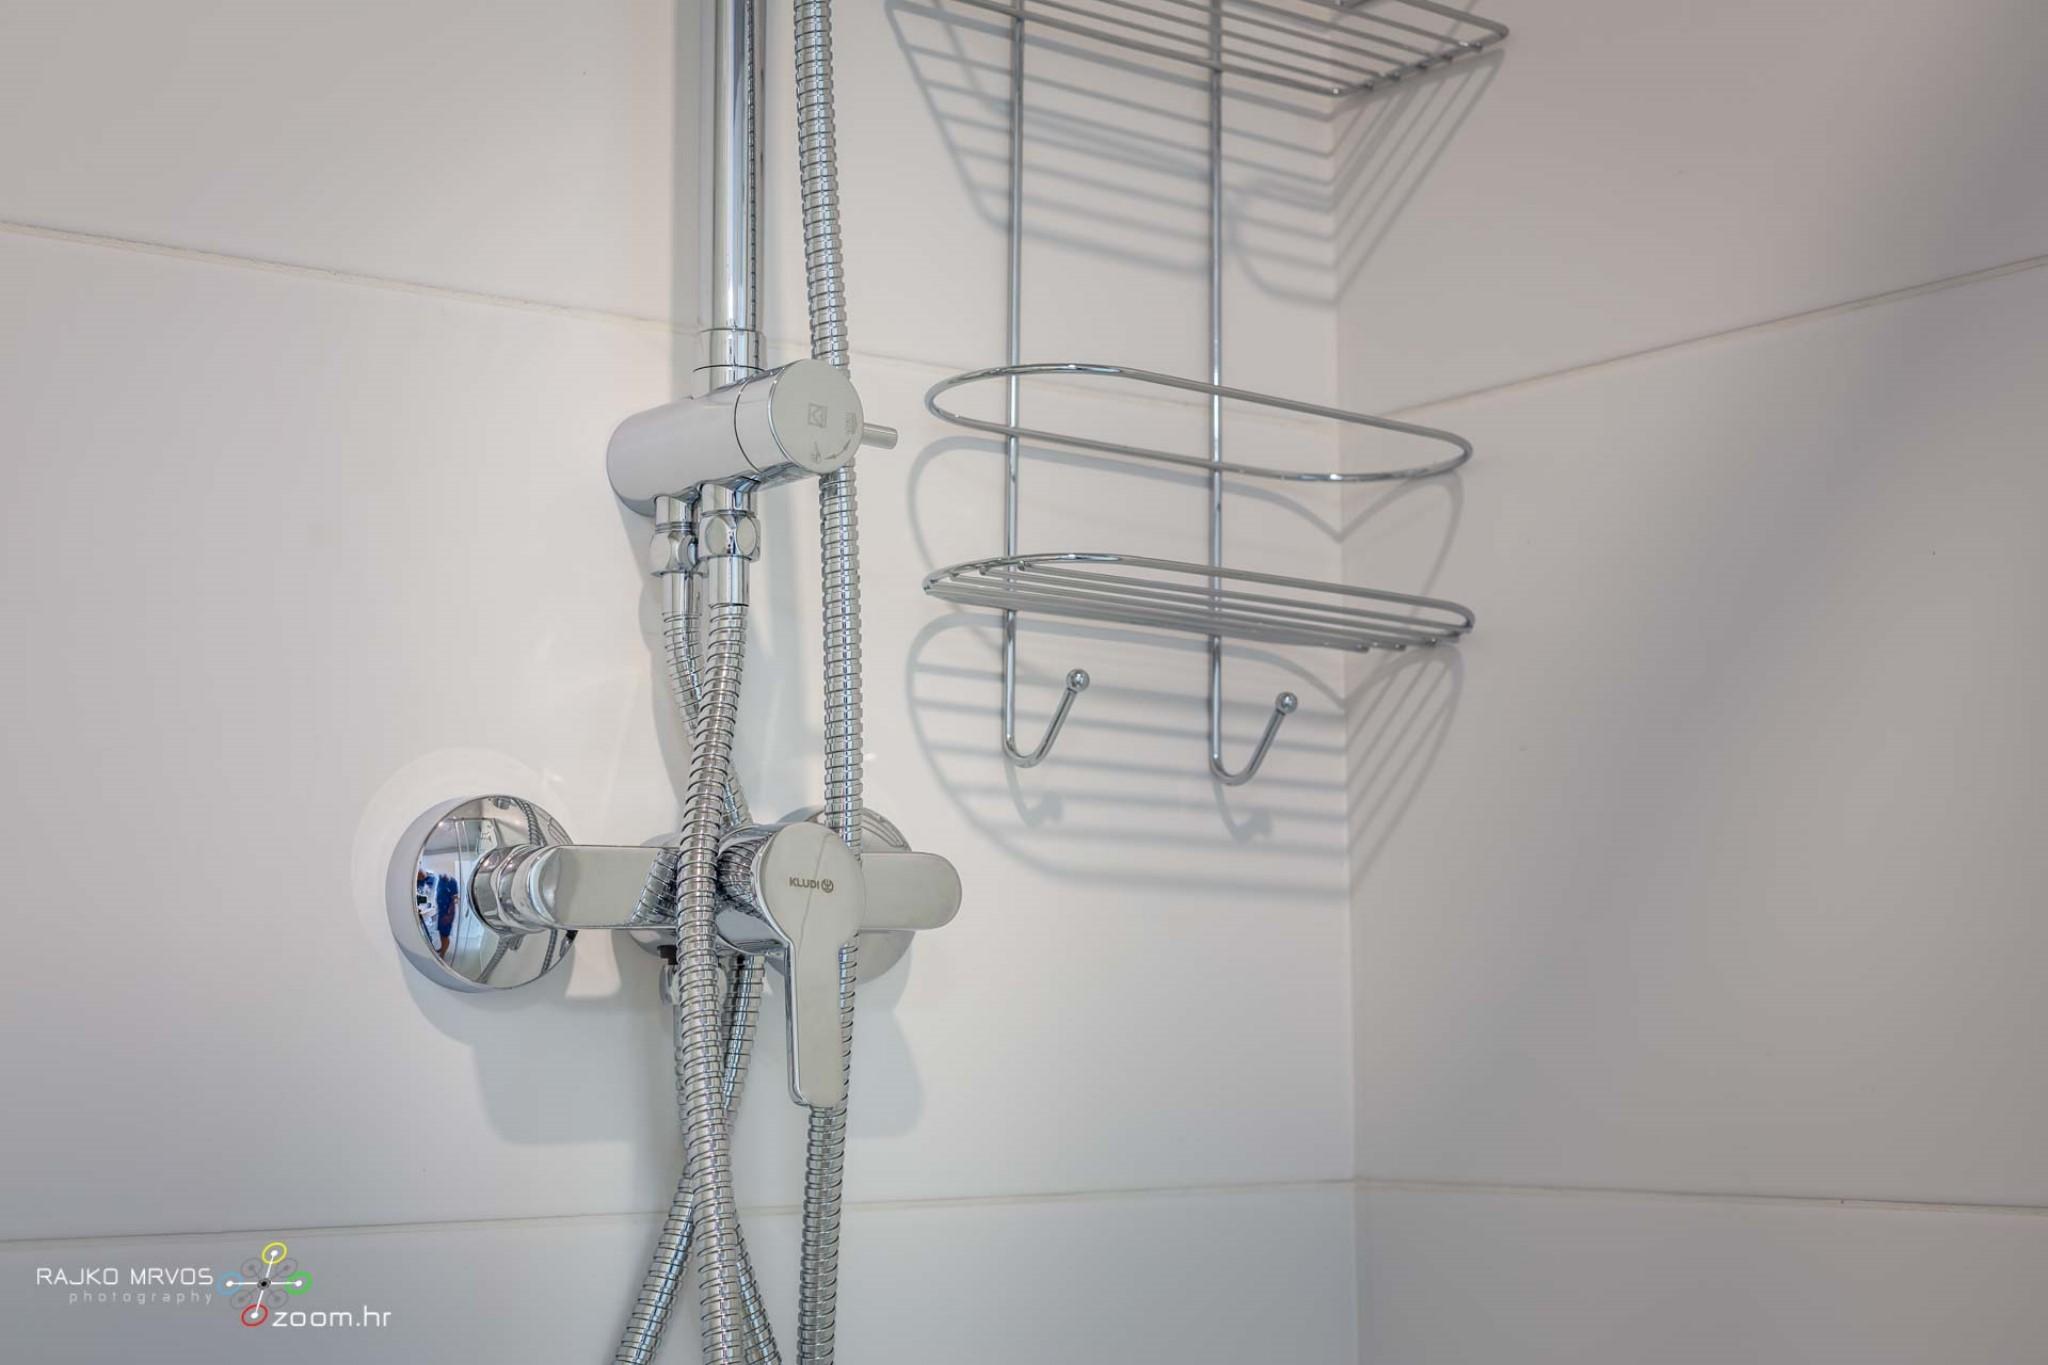 fotografiranje-interijera-fotograf-eksterijera-apartmana-vila-kuca-apartmani-Preelook-79